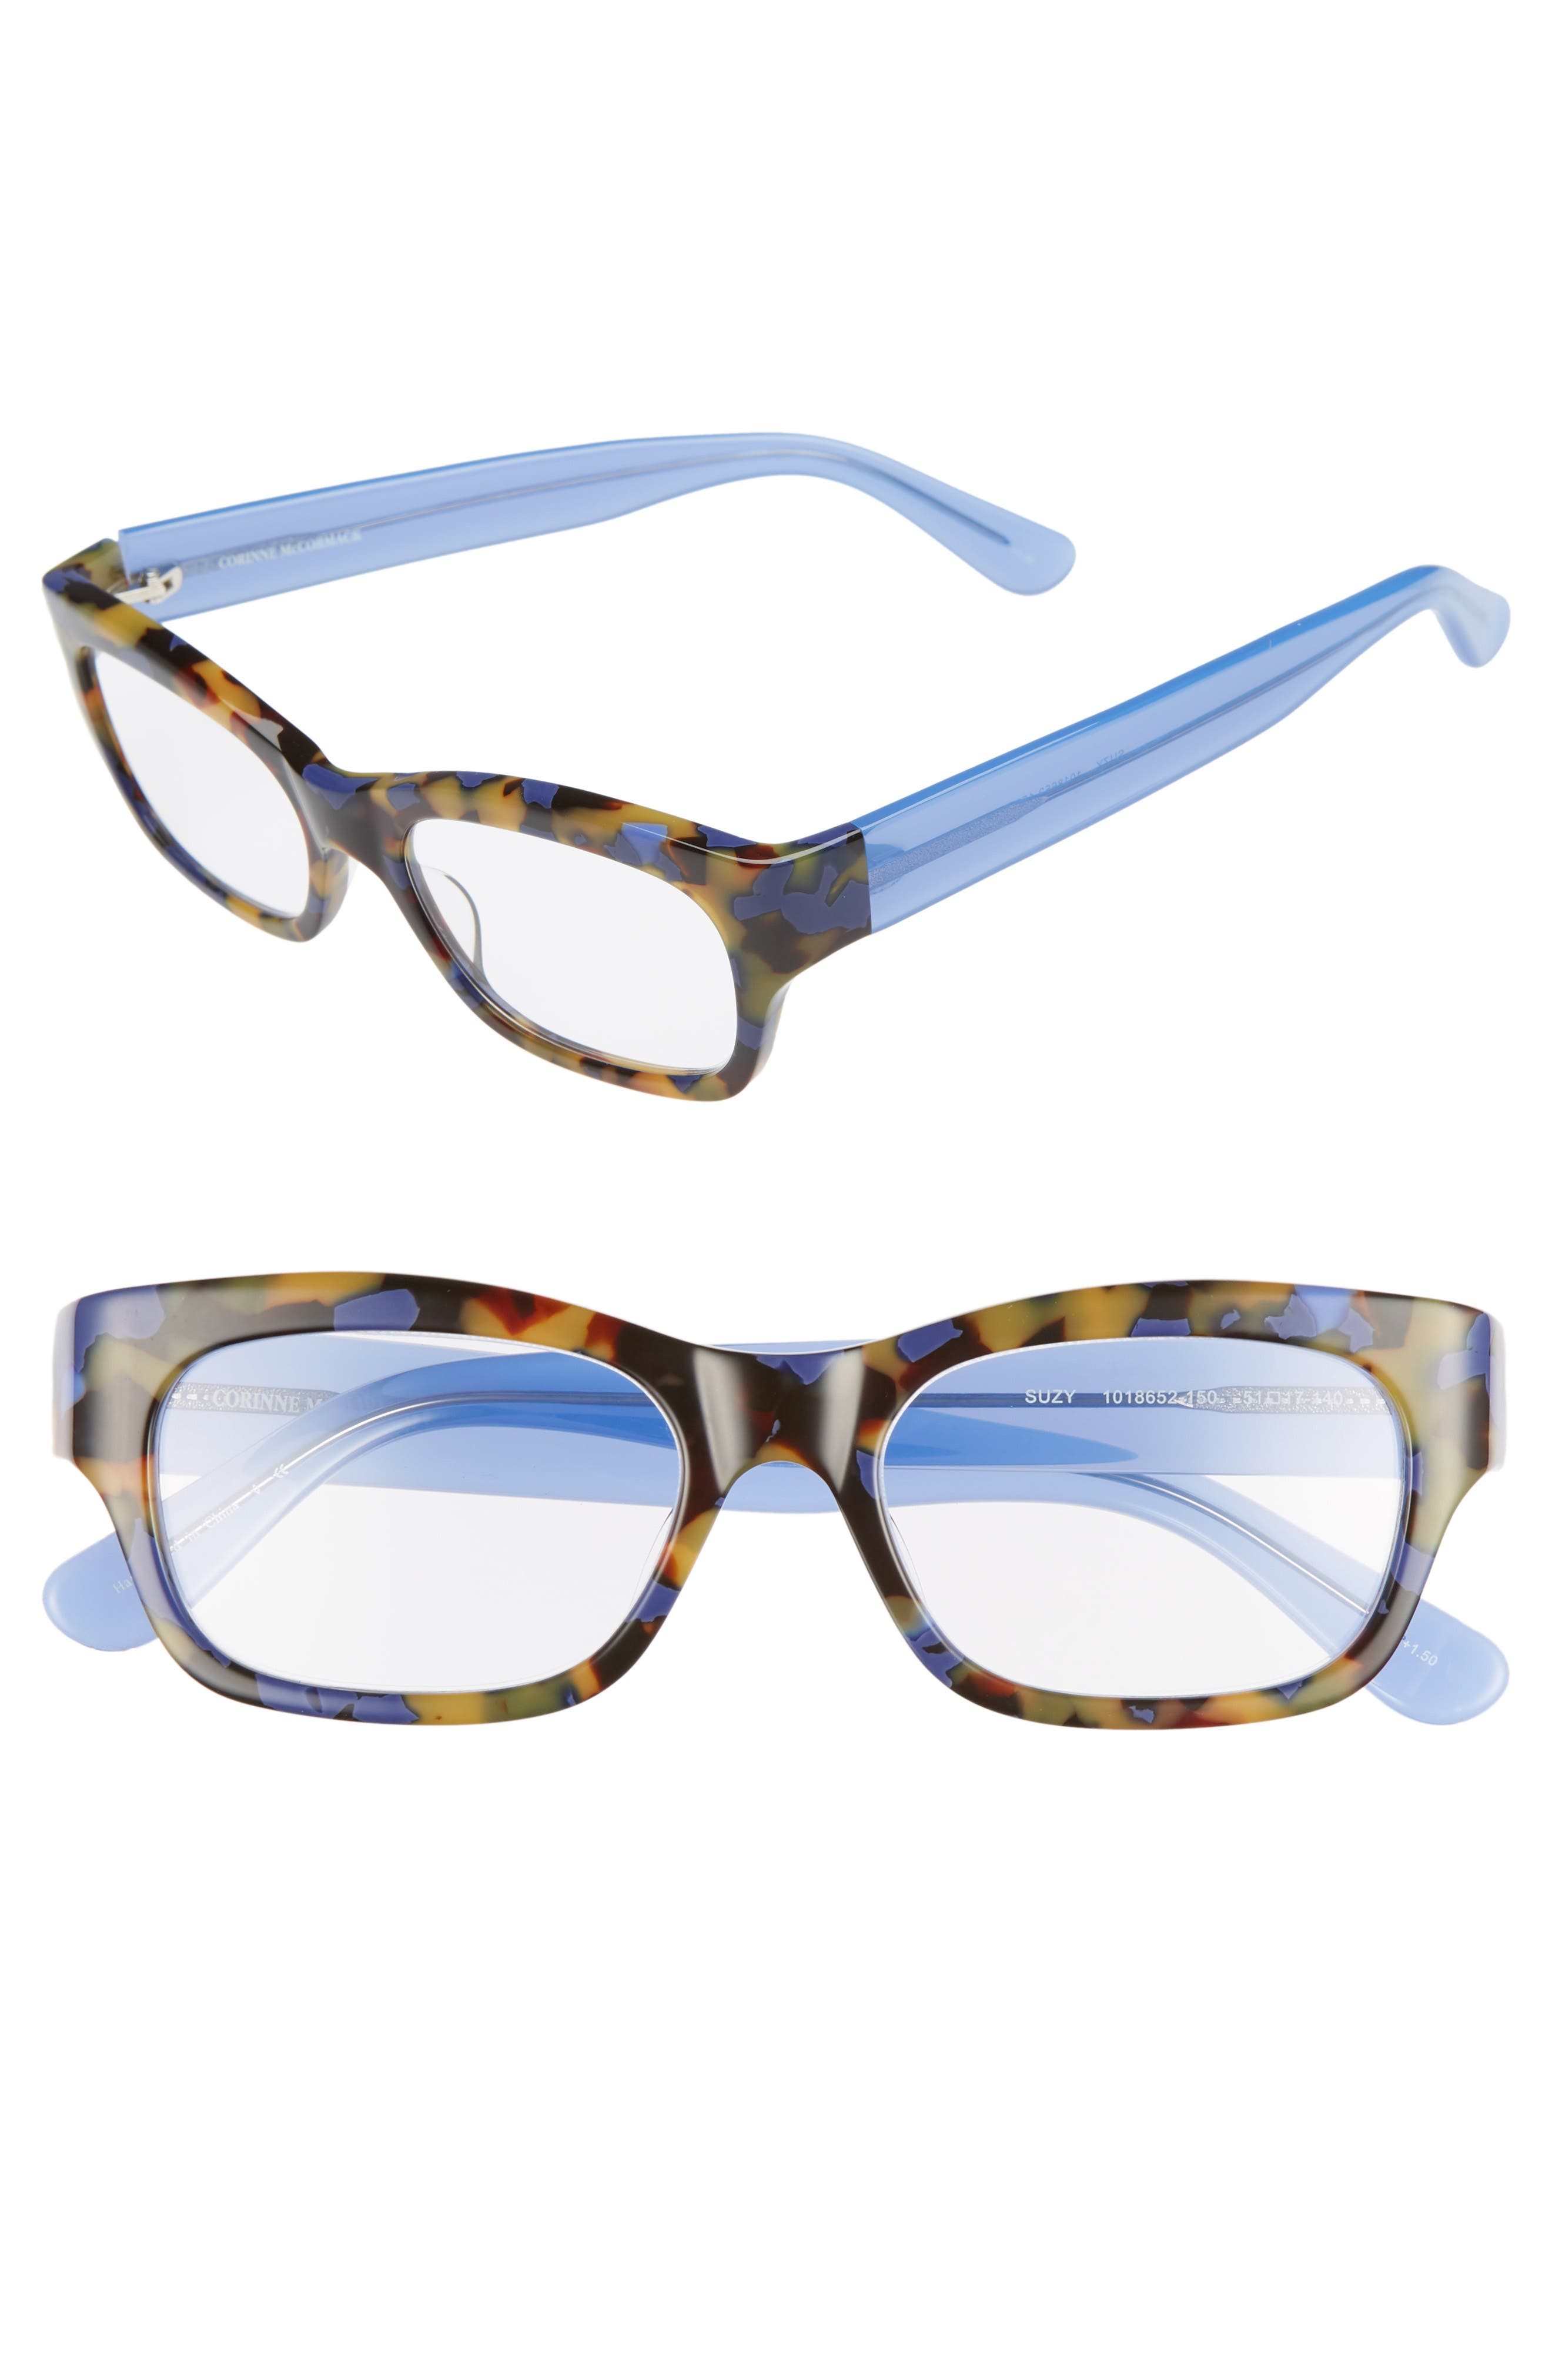 Suzy 51mm Reading Glasses,                         Main,                         color, TORTOISE BLUE